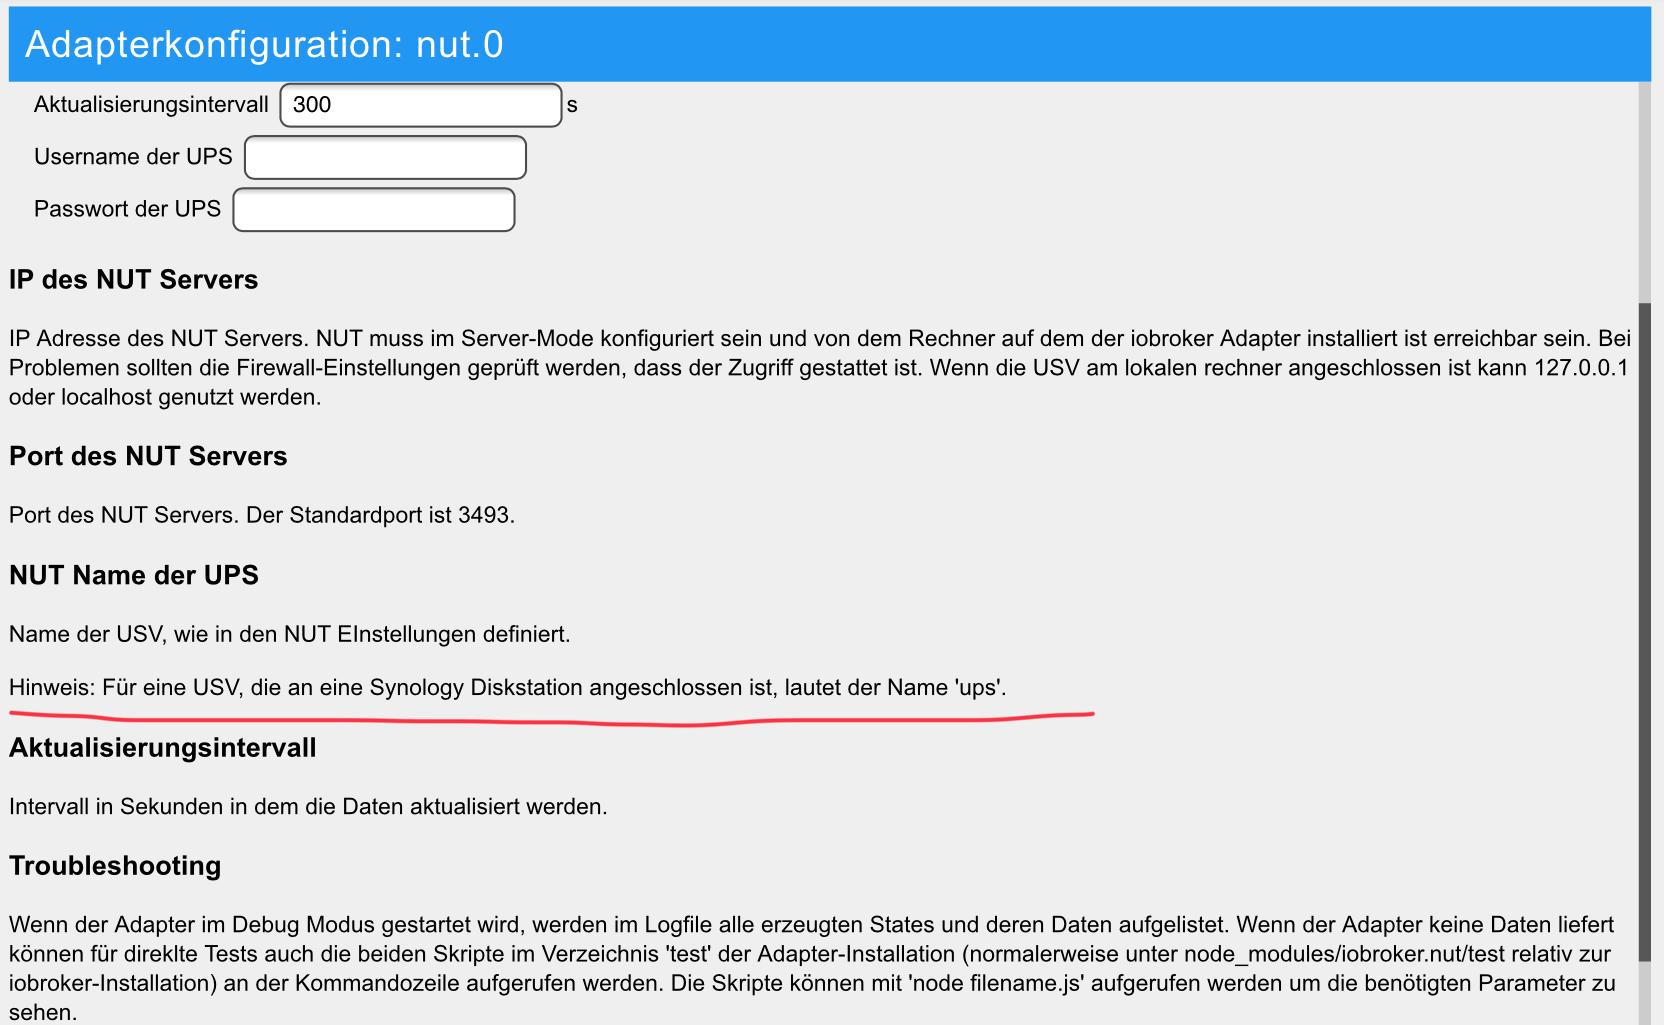 Adapter] NUT Adapter (USV/UPS auslesen per NUT)